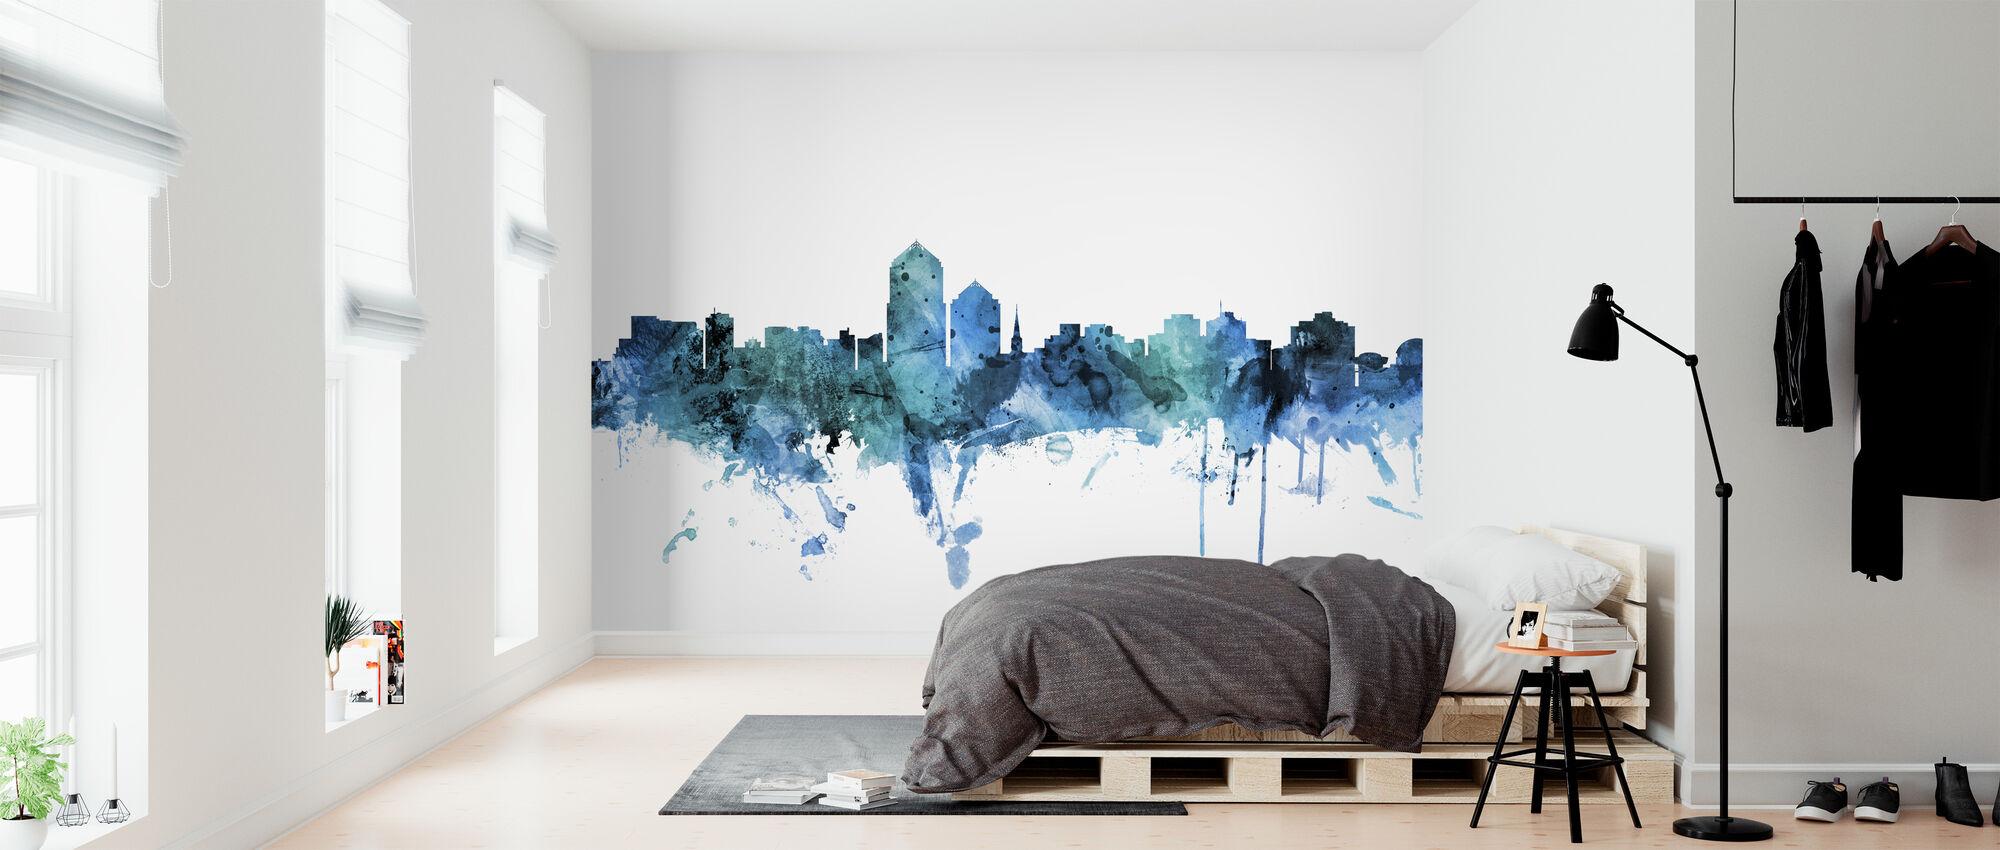 Albuquerque New Mexico Skyline - Wallpaper - Bedroom